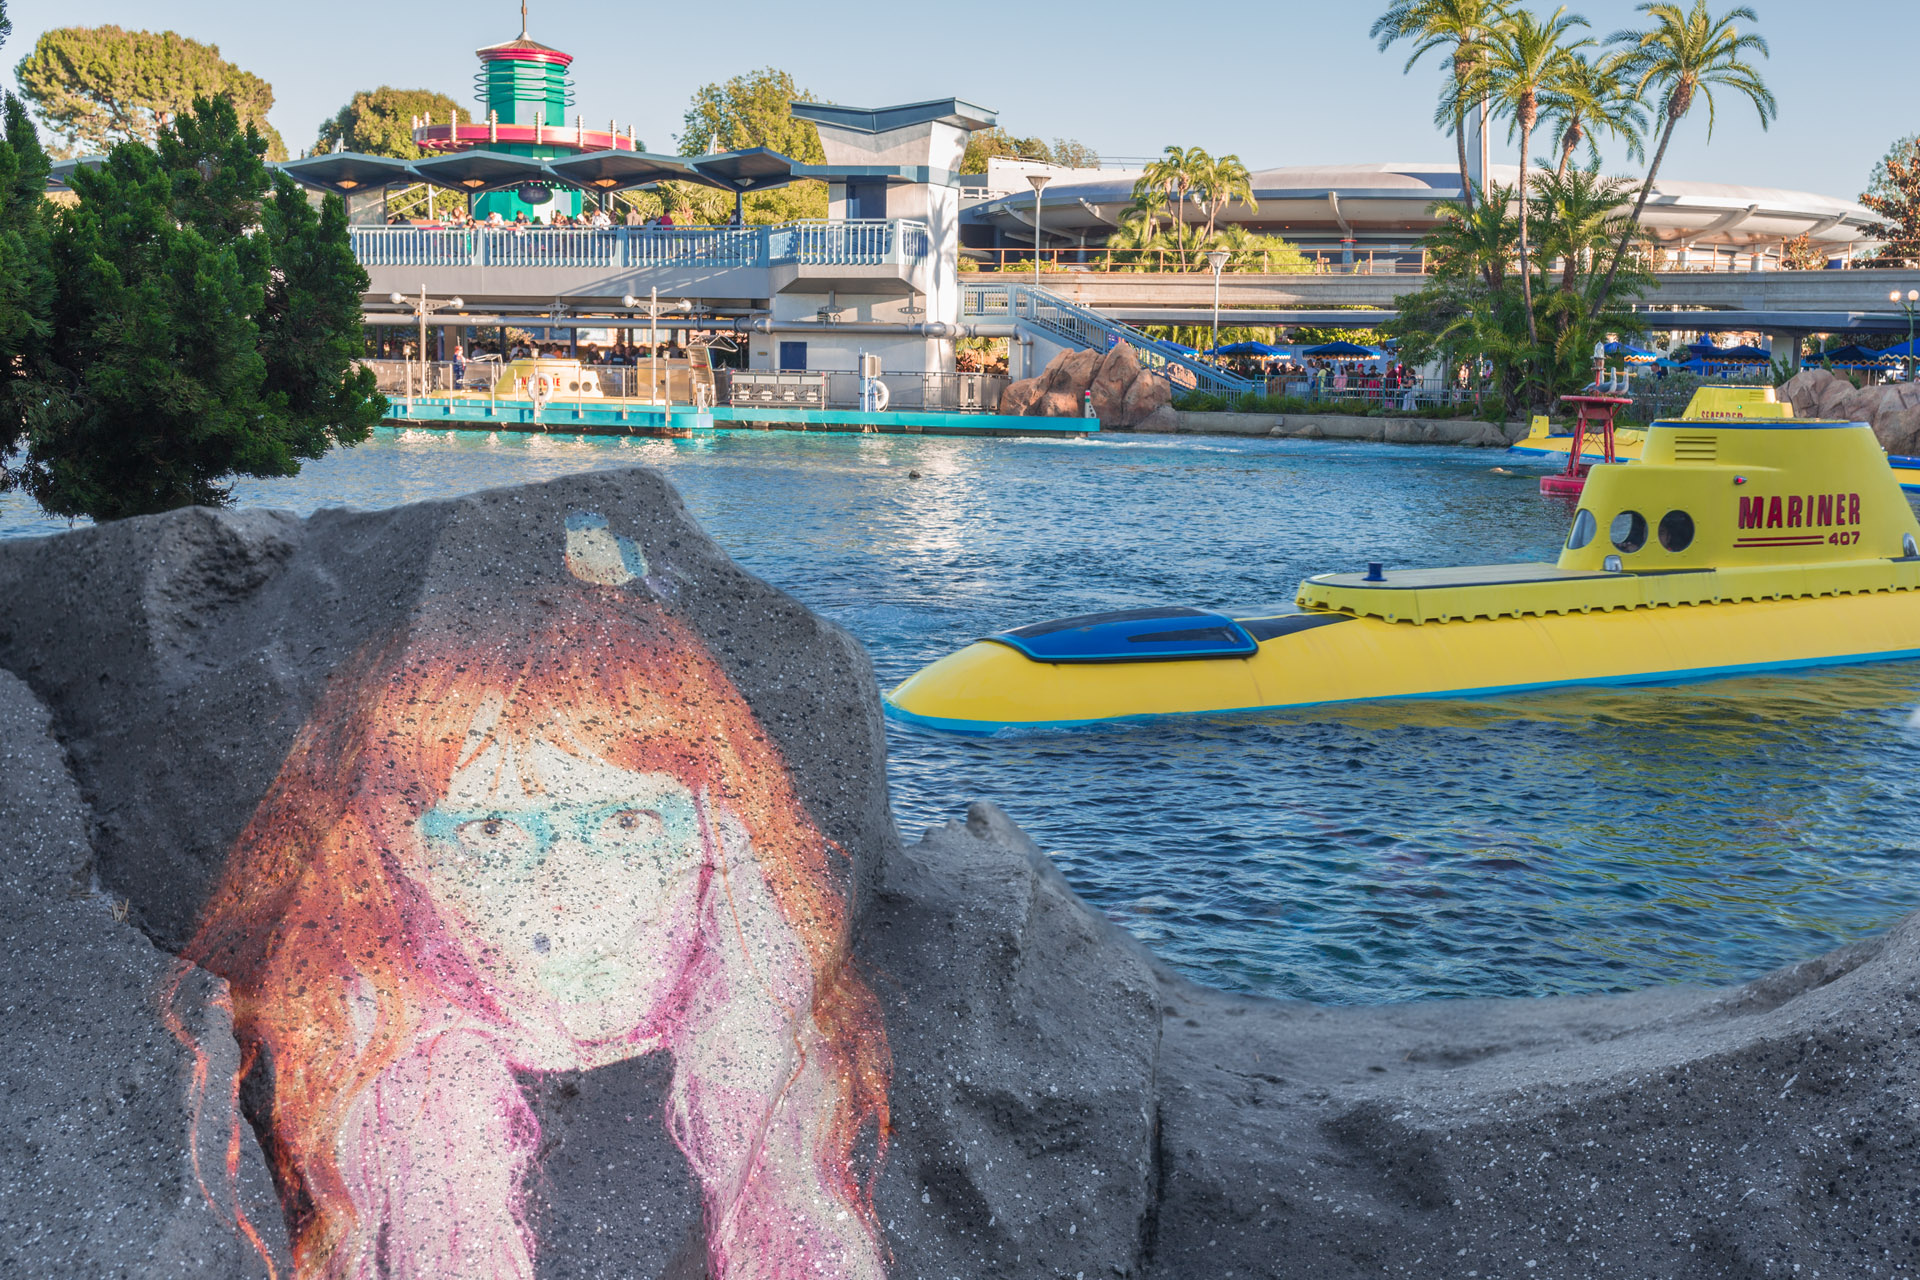 3-3 Bring the Mermaids Back [Tomorrowland]